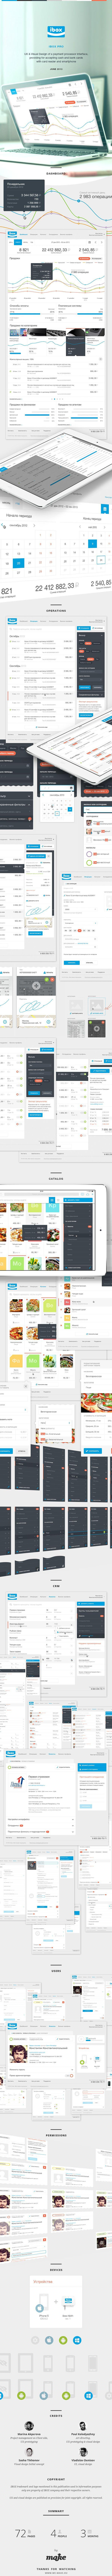 IBOX Pro on Web Design Served